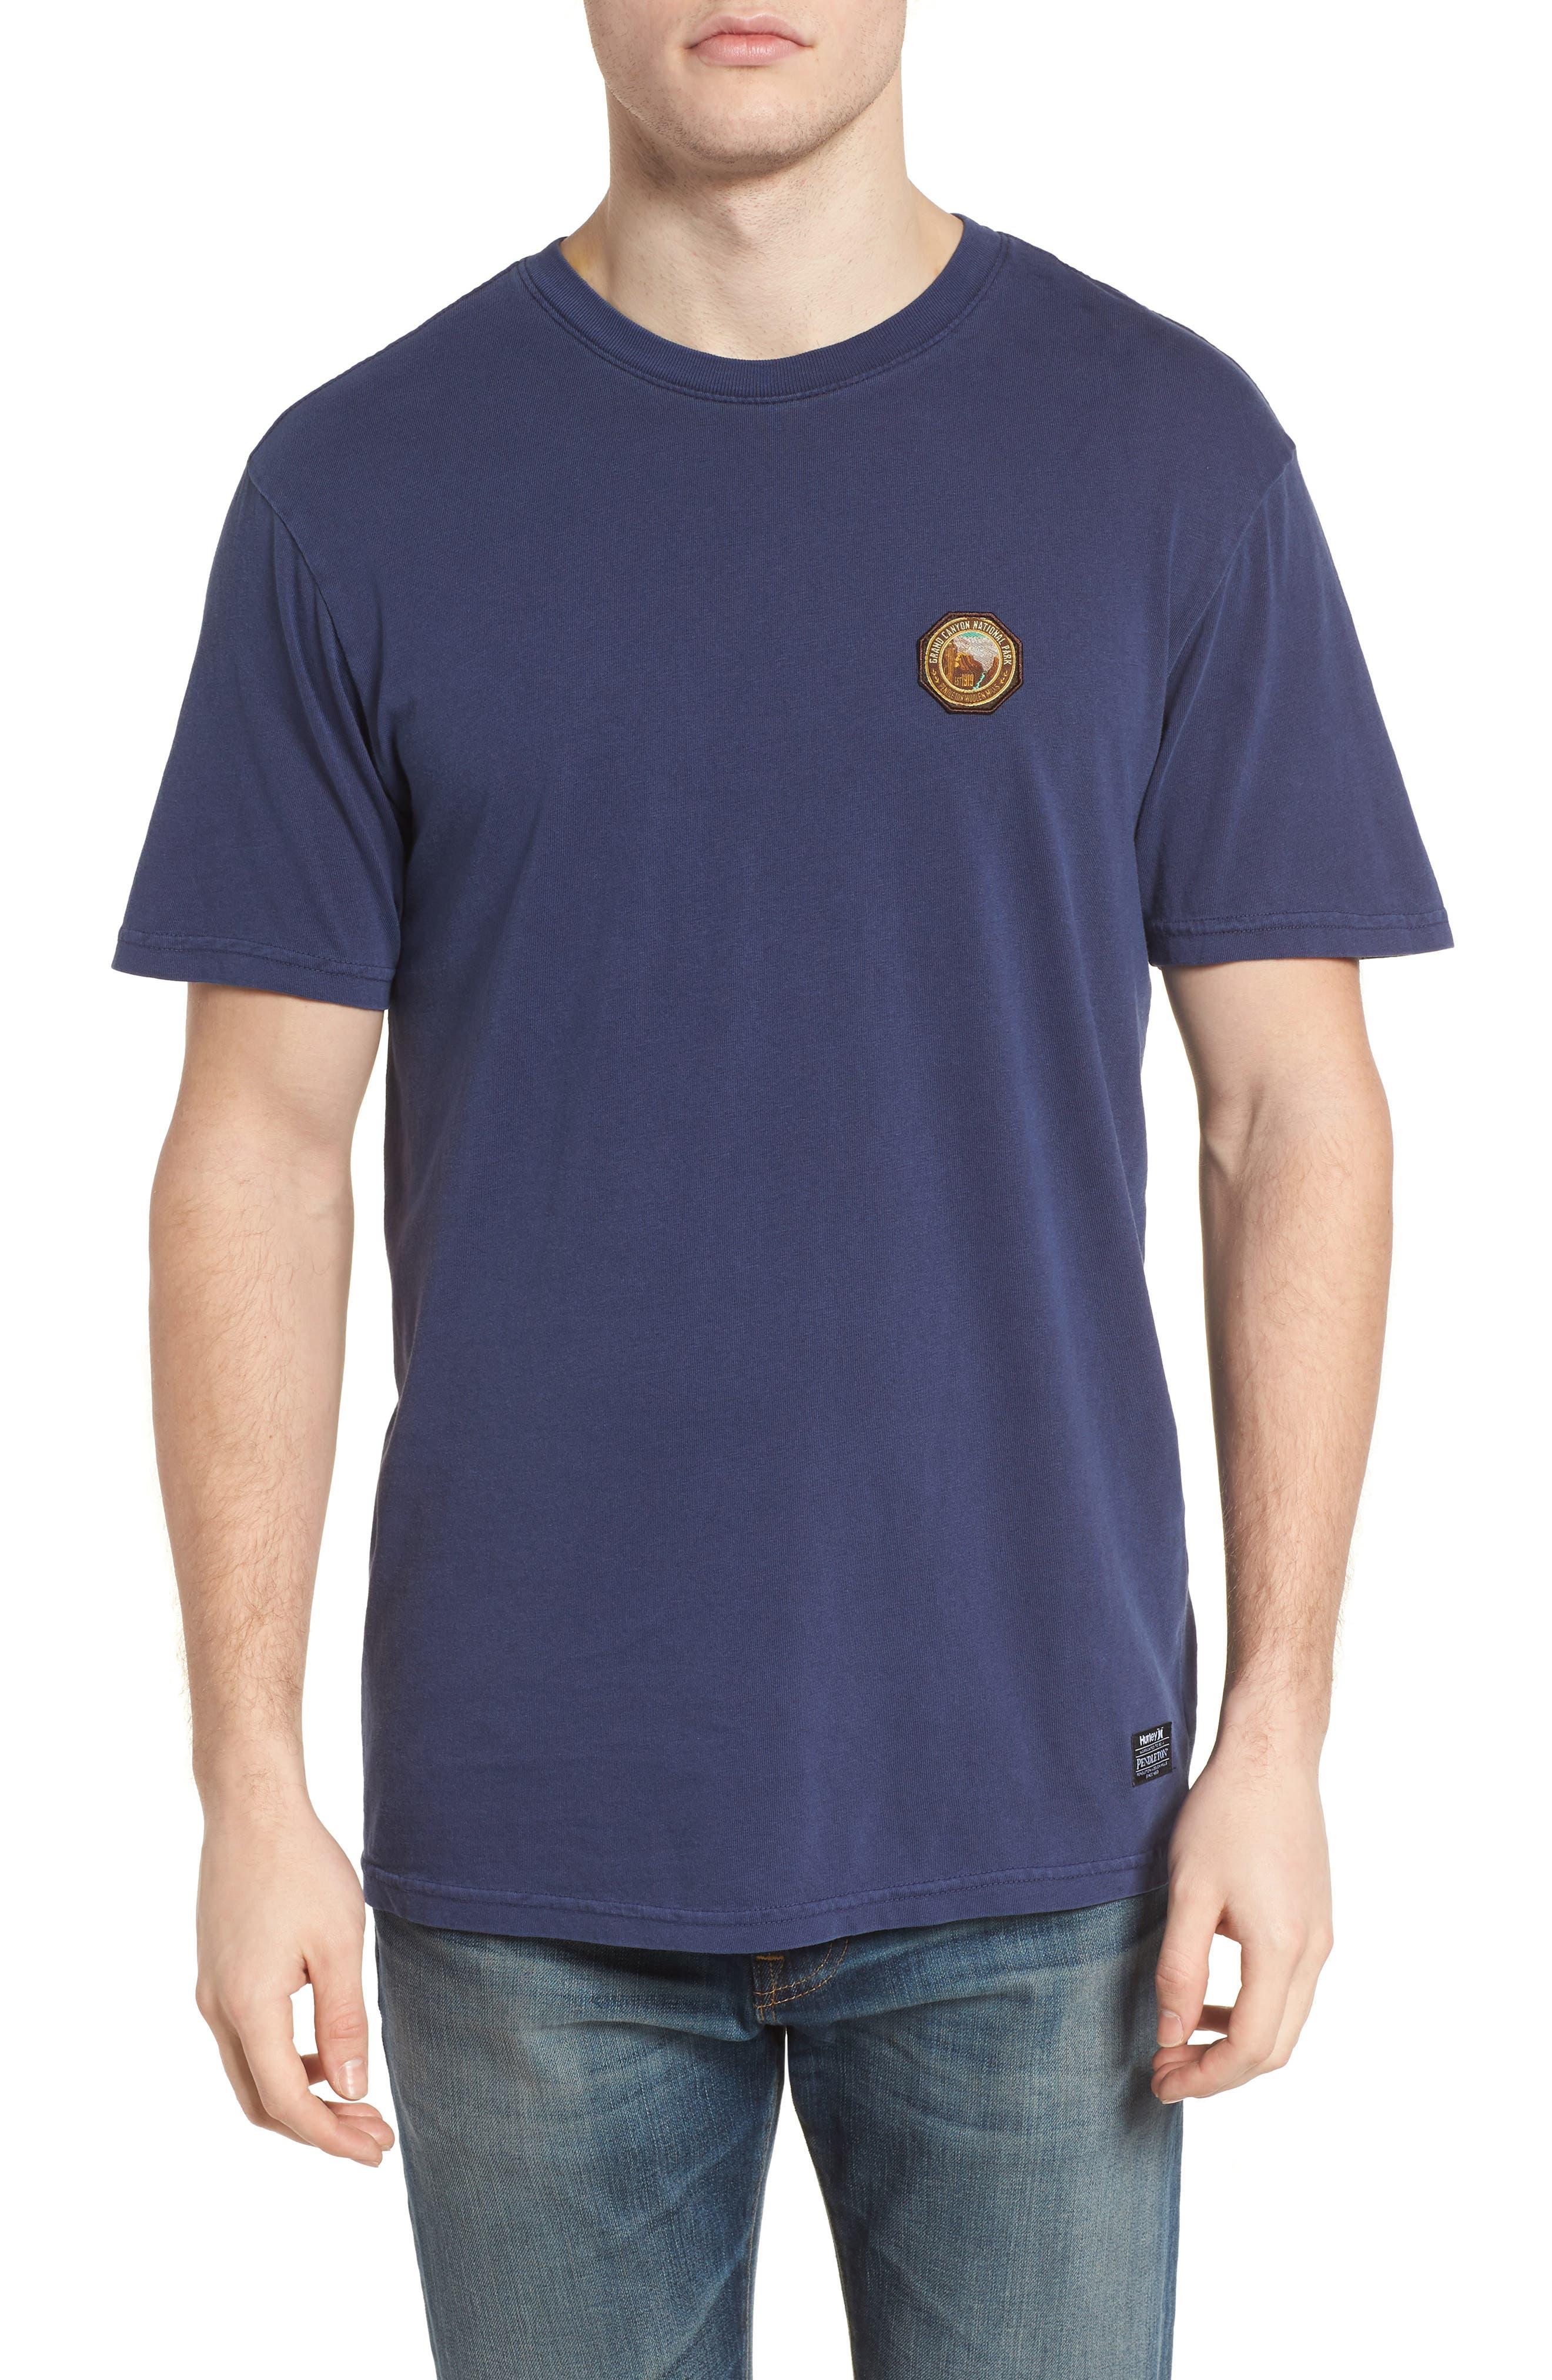 Hurley x Pendleton Grand Canyon Patch T-Shirt